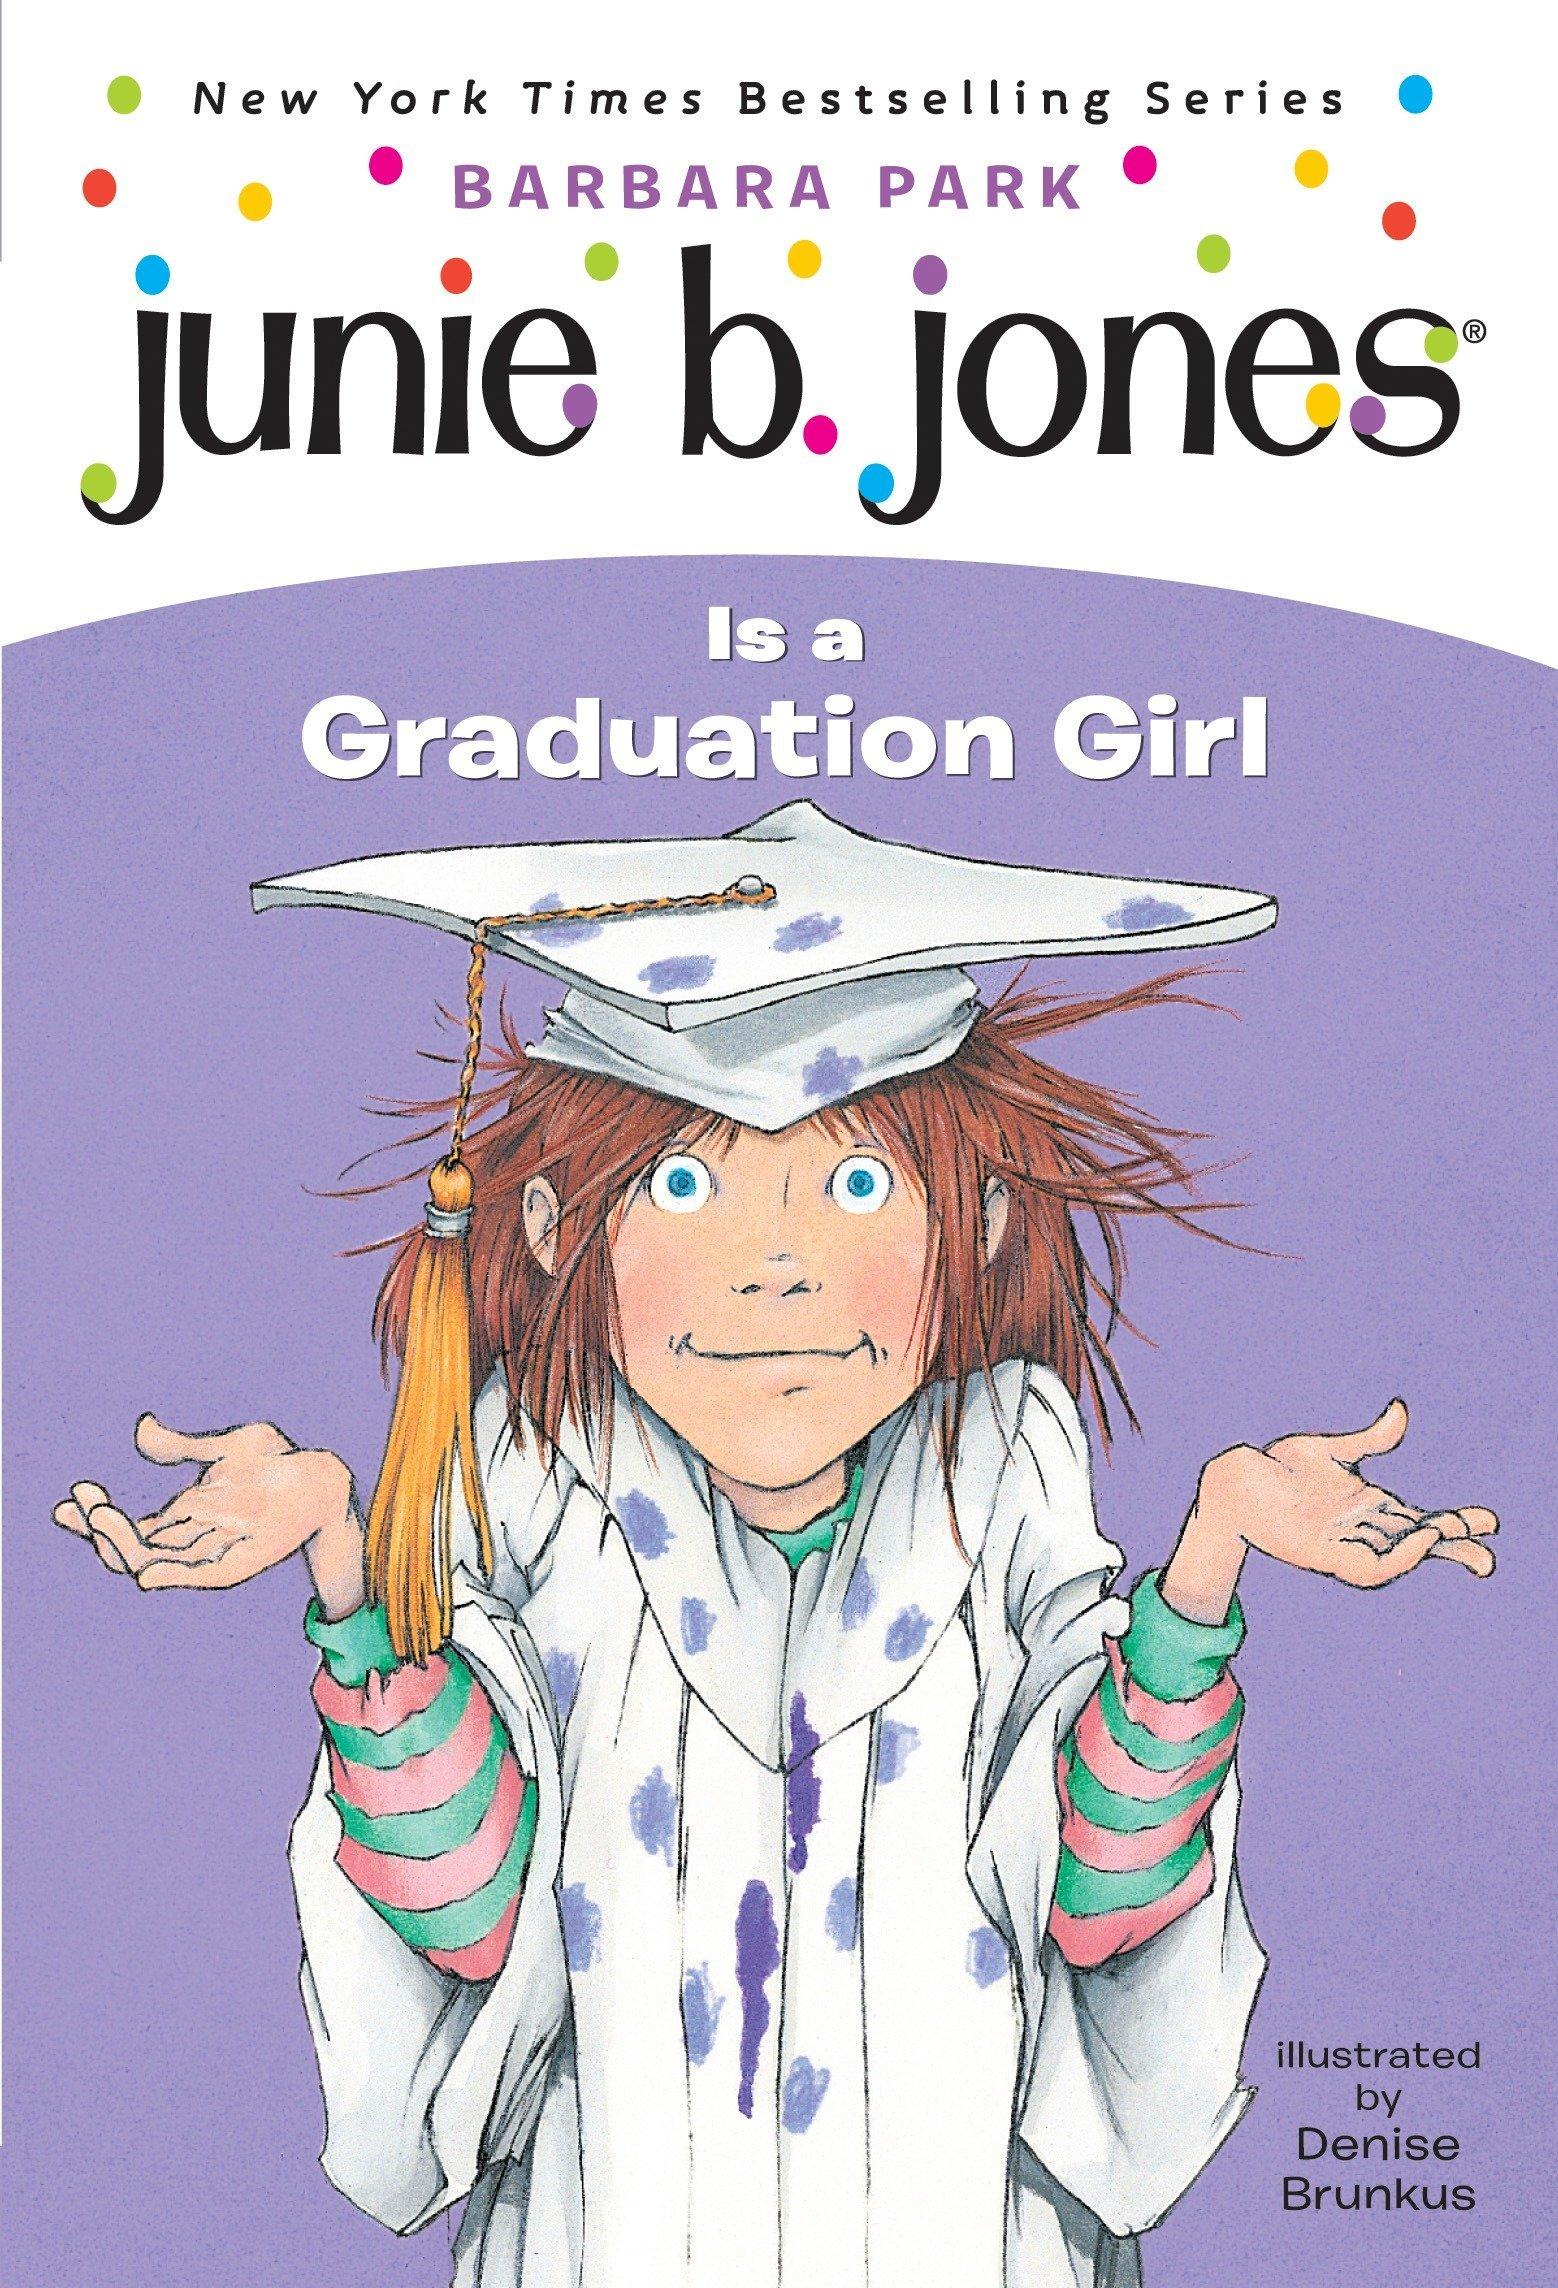 Junie Jones Graduation Girl No product image